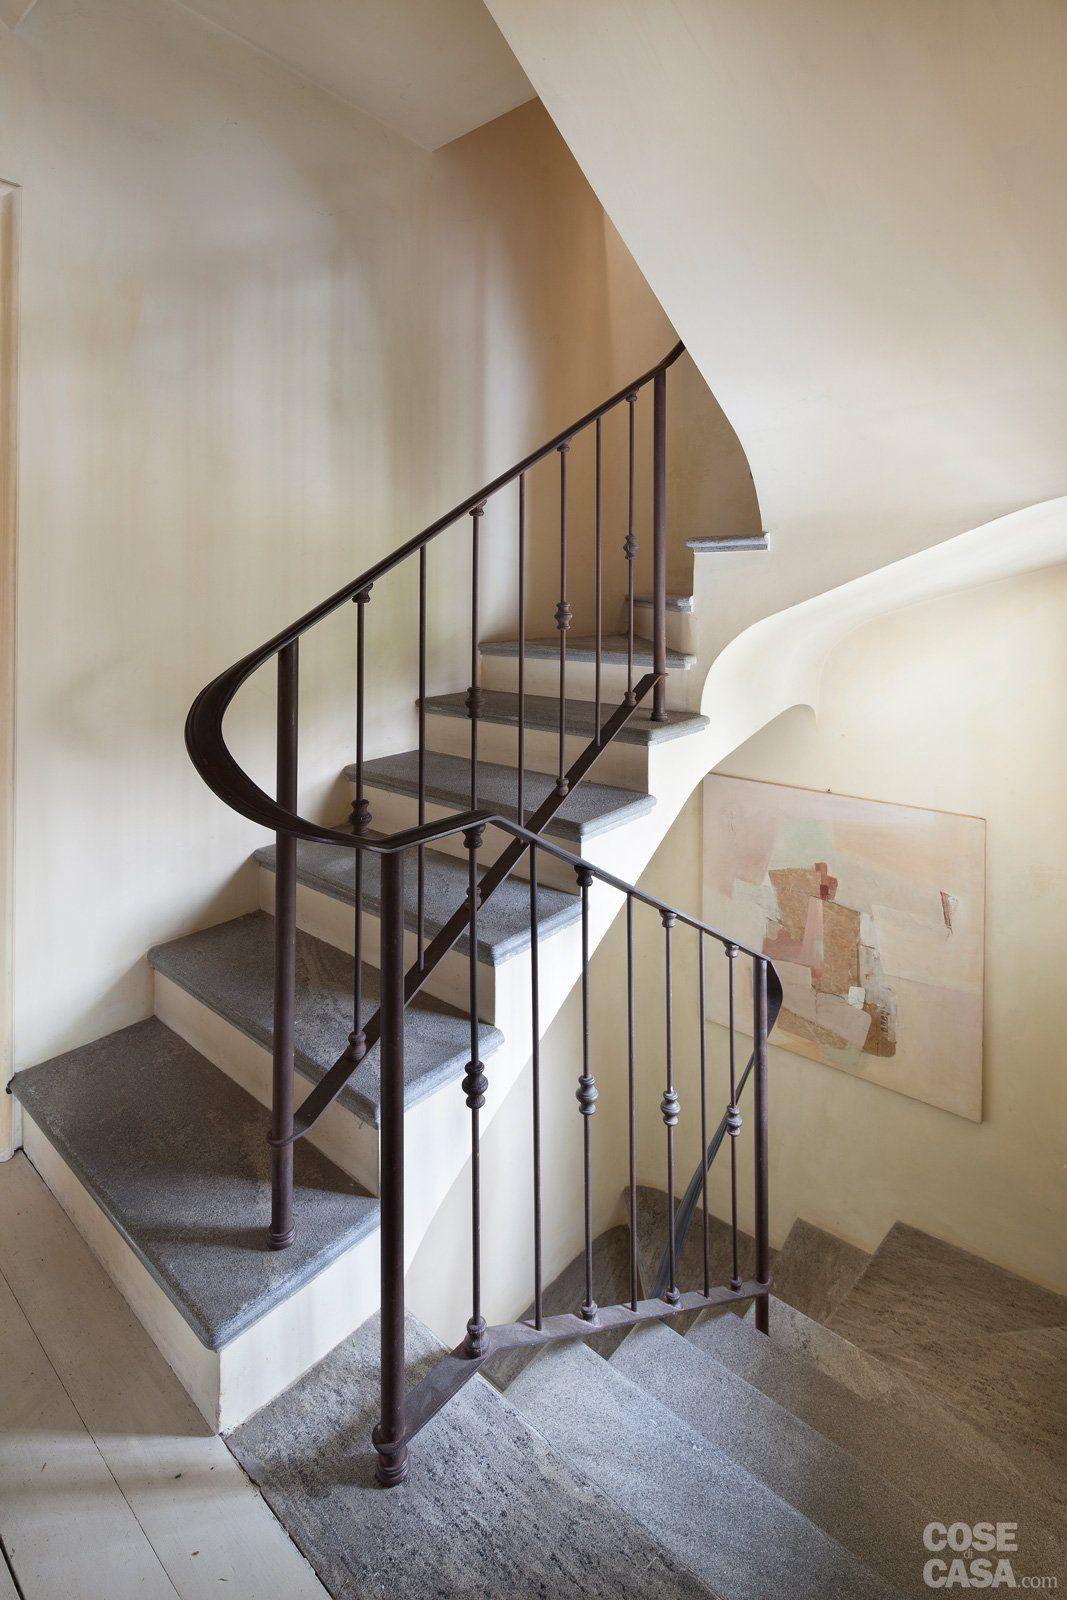 Pitturare Interni Casa Con Murales Manga  bandung 2022